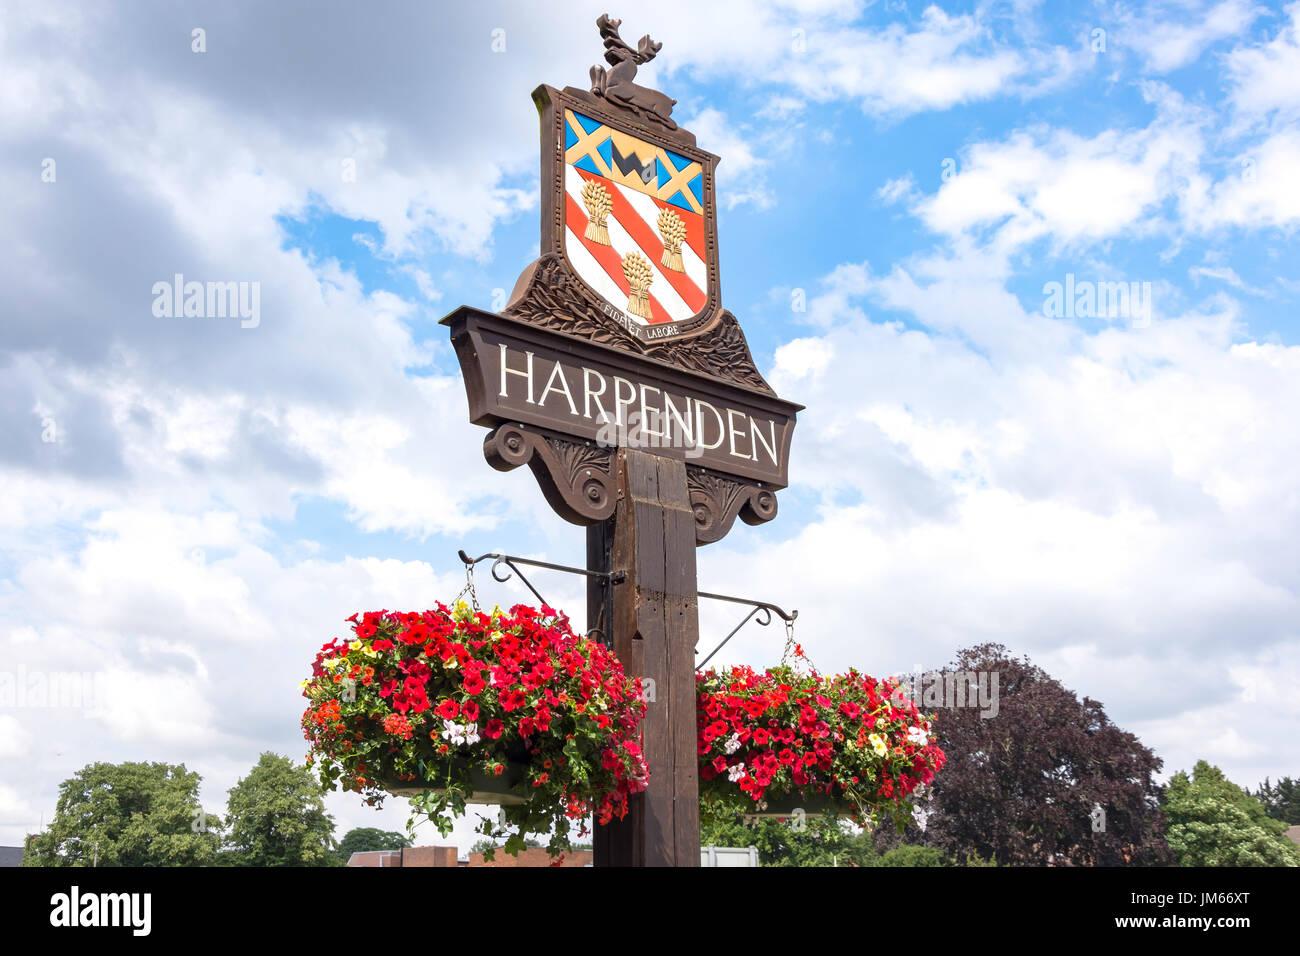 Town sign on Harpenden Common, Harpenden, Hertfordshire, England, United Kingdom - Stock Image